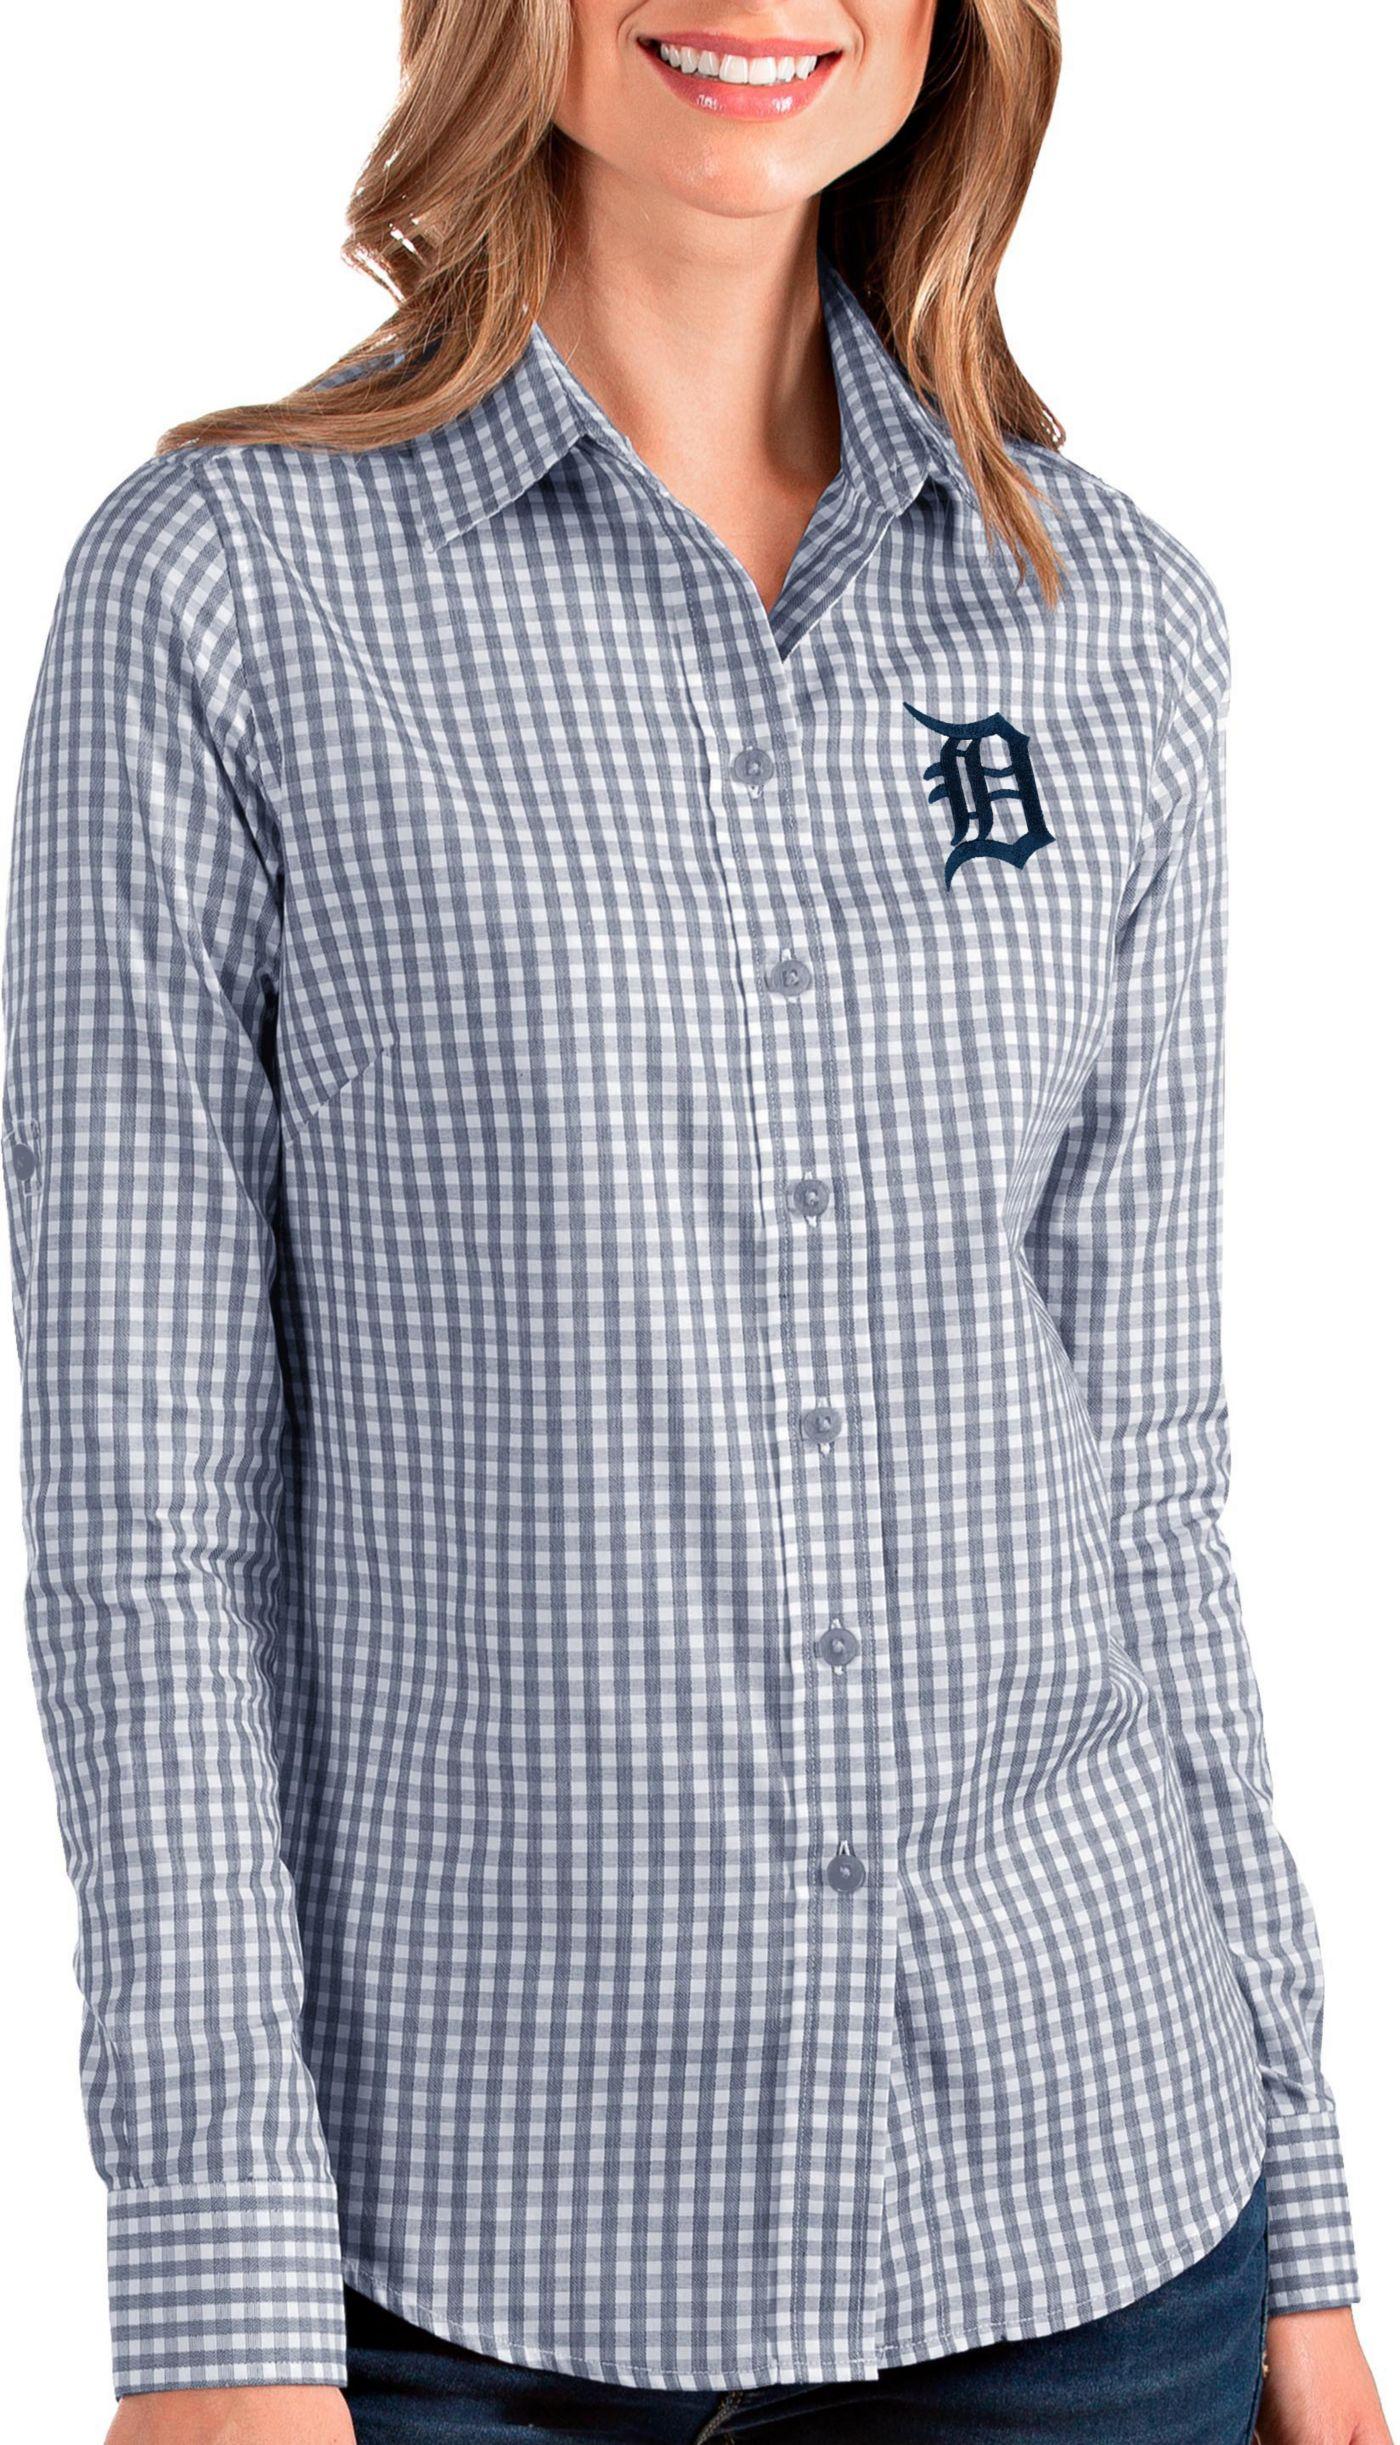 Antigua Women's Detroit Tigers Structure Button-Up Navy Long Sleeve Shirt